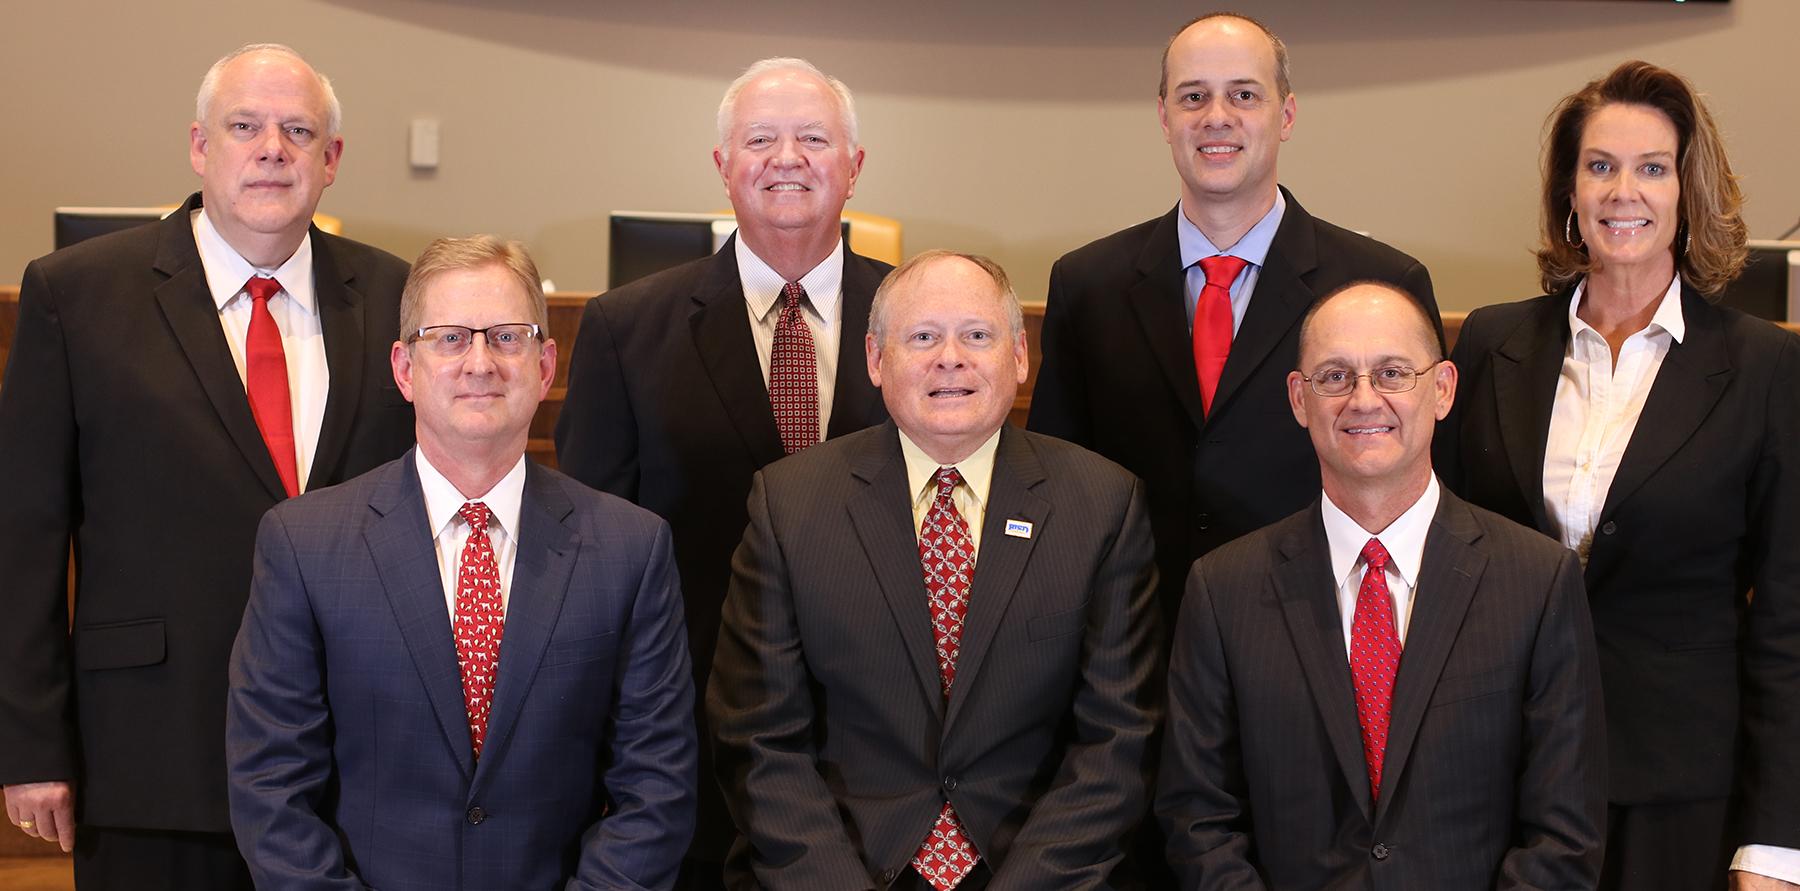 2019-20 Board of Trustees